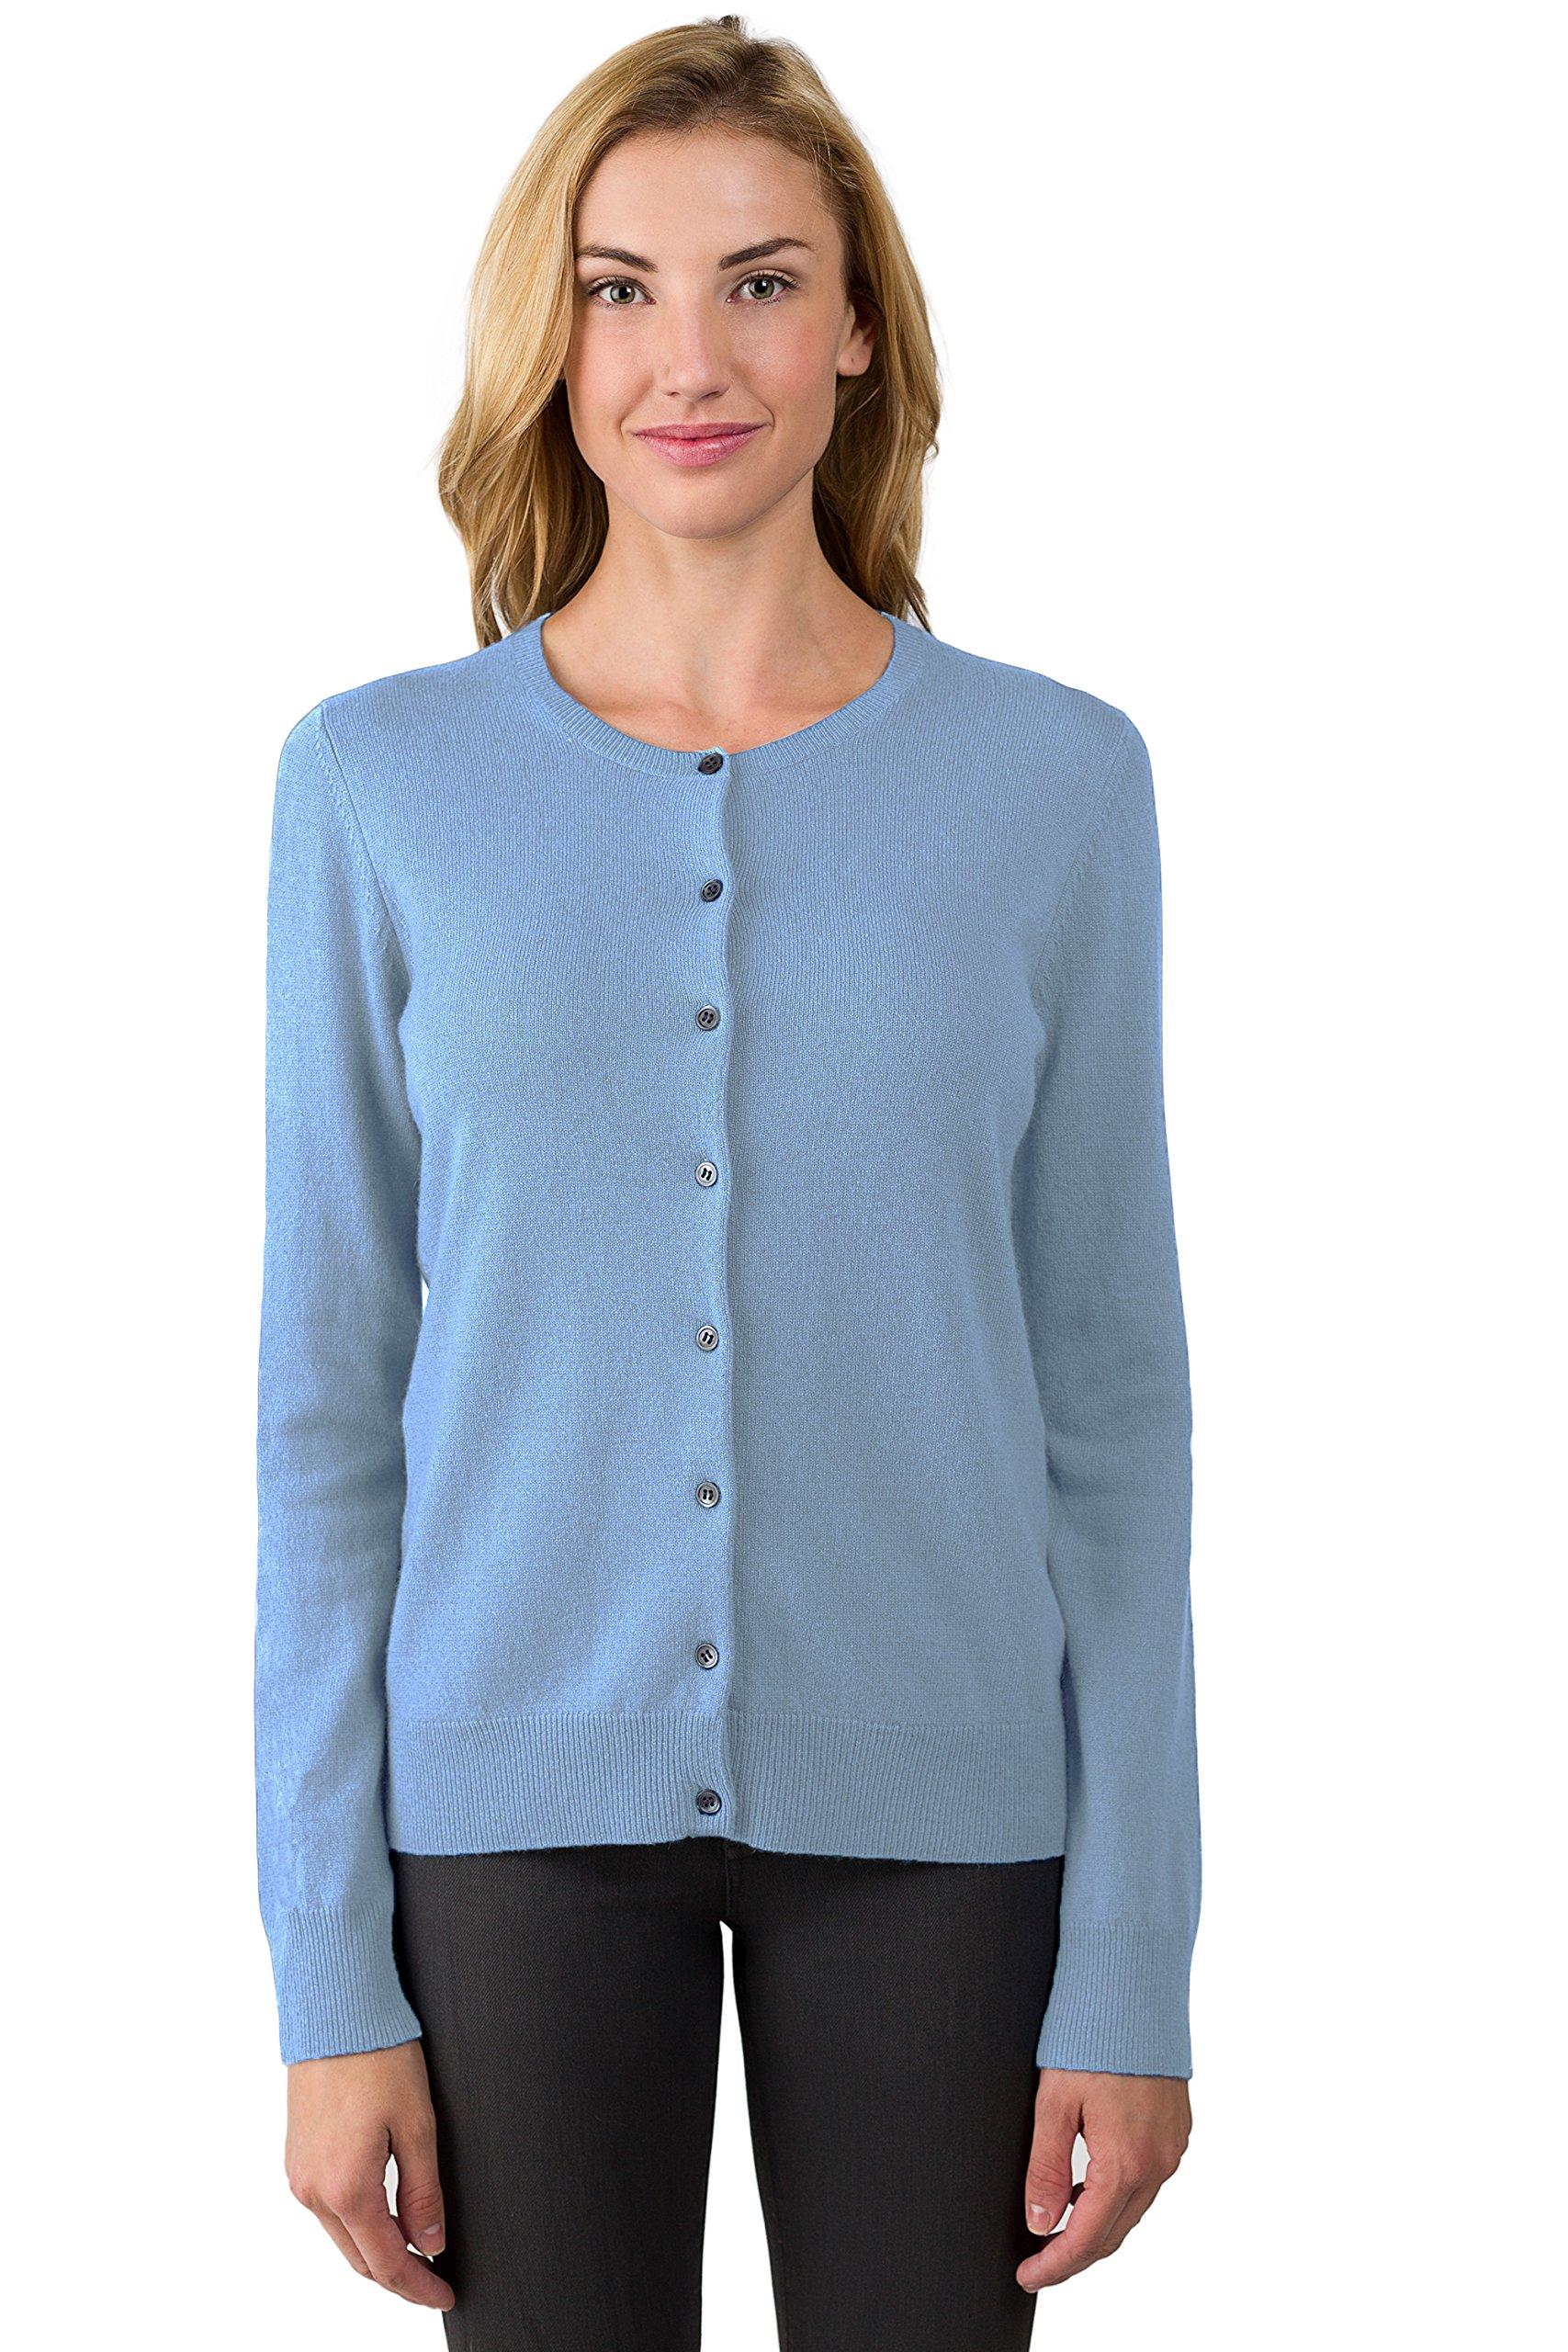 JENNIE LIU Women's 100% Cashmere Button Front Long Sleeve Crewneck Cardigan Sweater(L, CrystalBlue) by JENNIE LIU